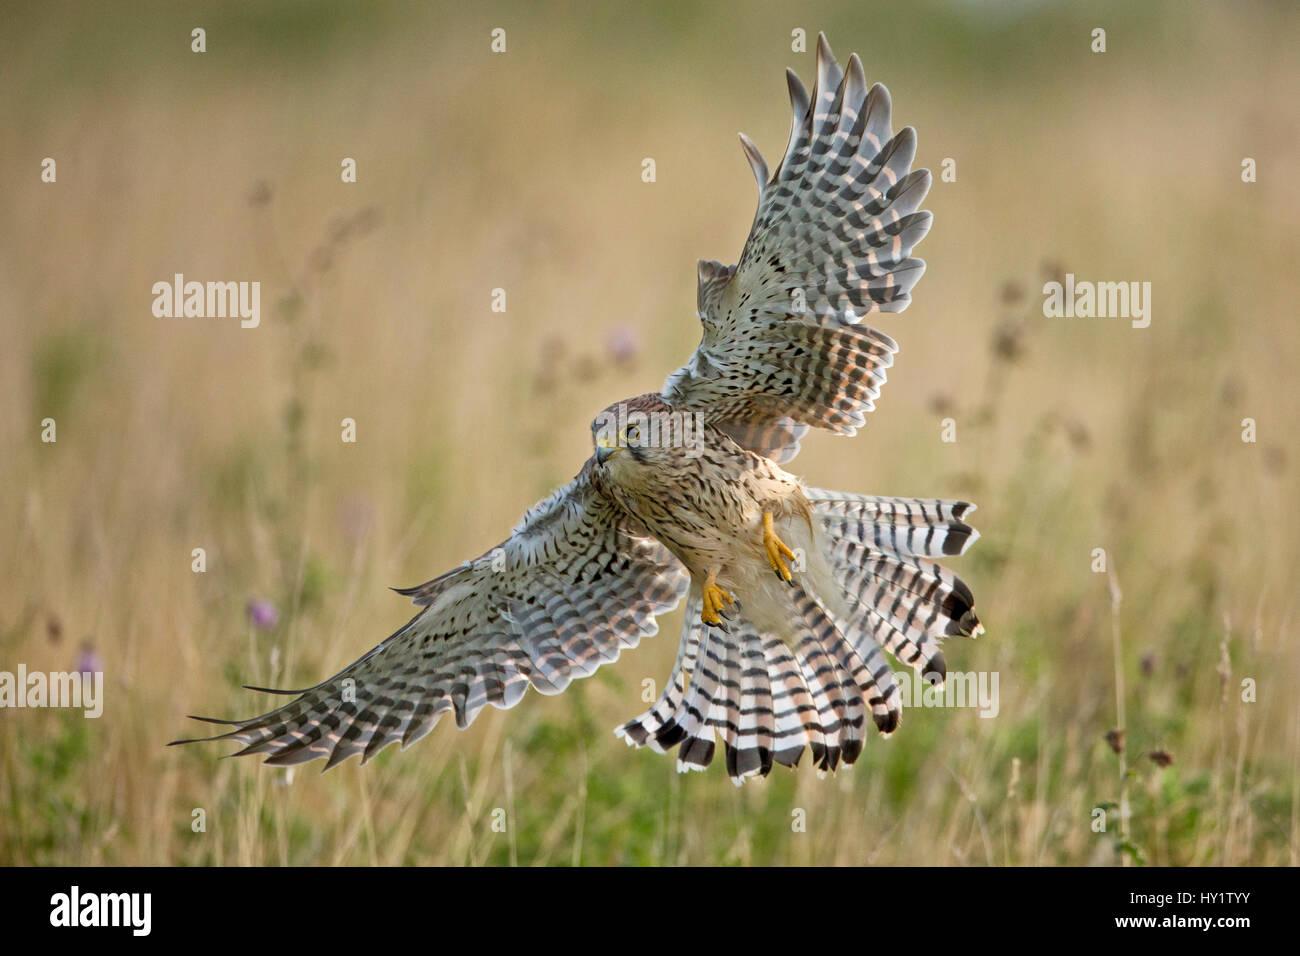 Kestrel (Falco tinninculus) swooping whilst hunting, UK - Stock Image